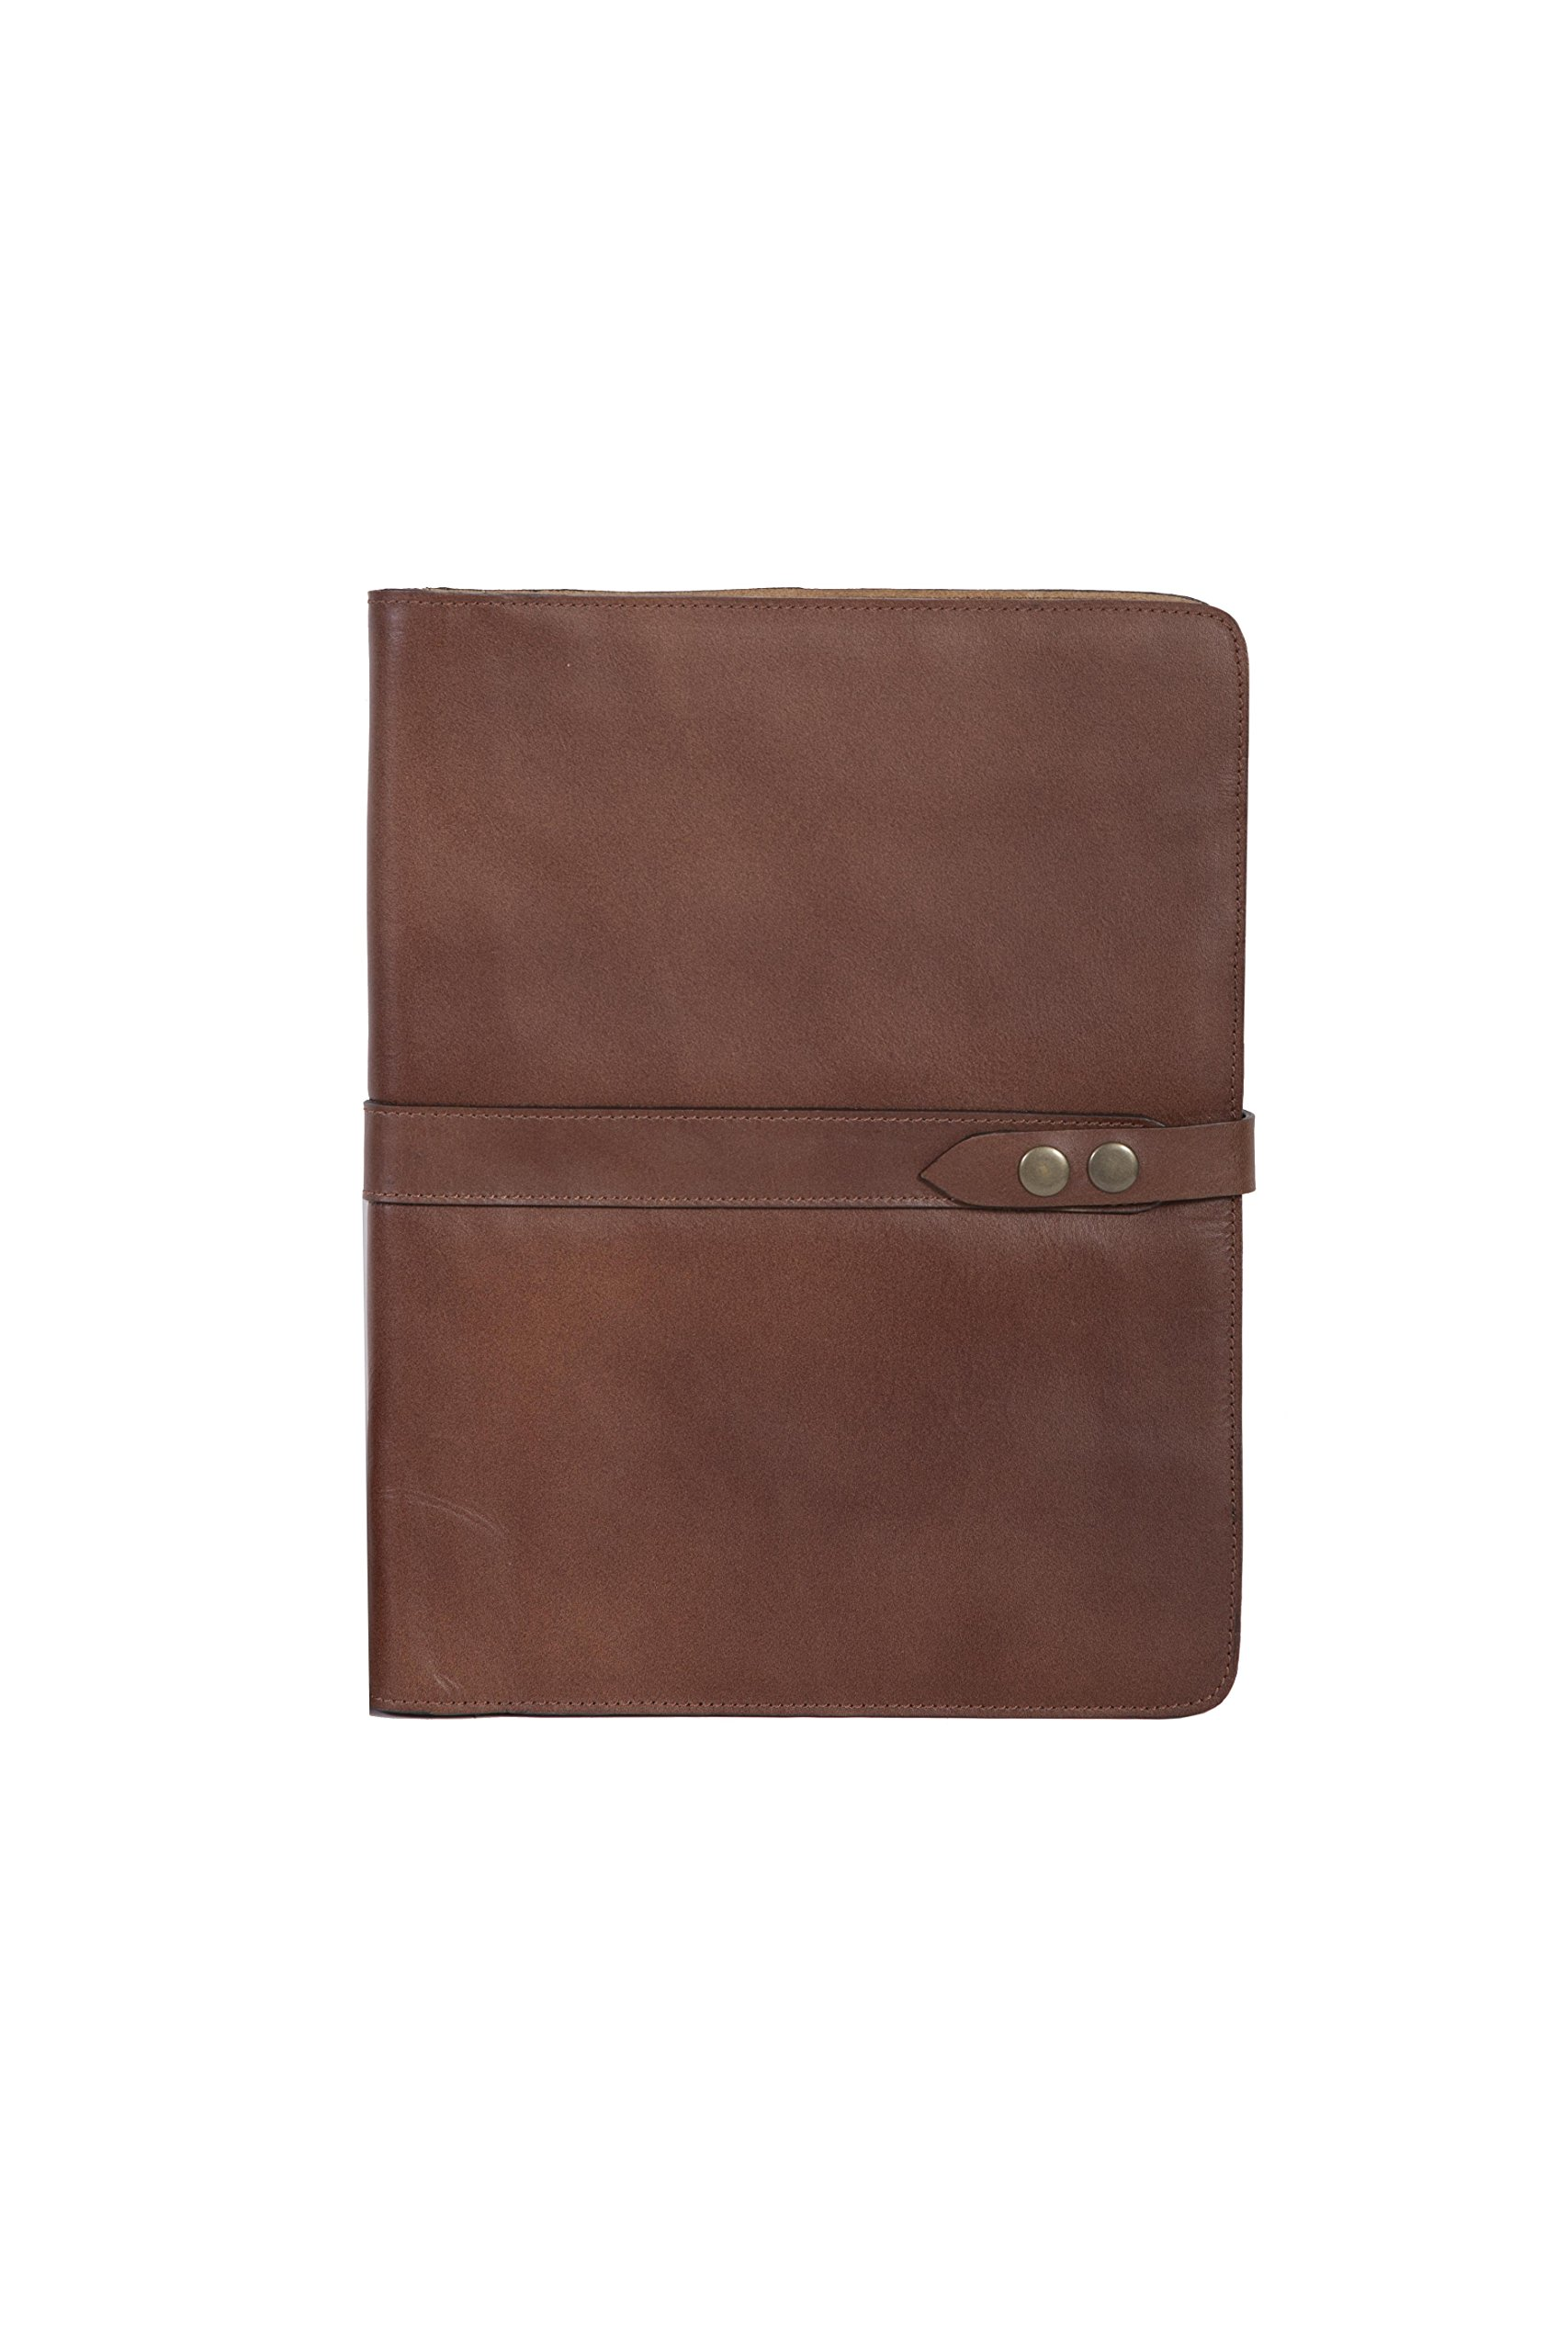 Snap Closure Leather Pad in Mahogany